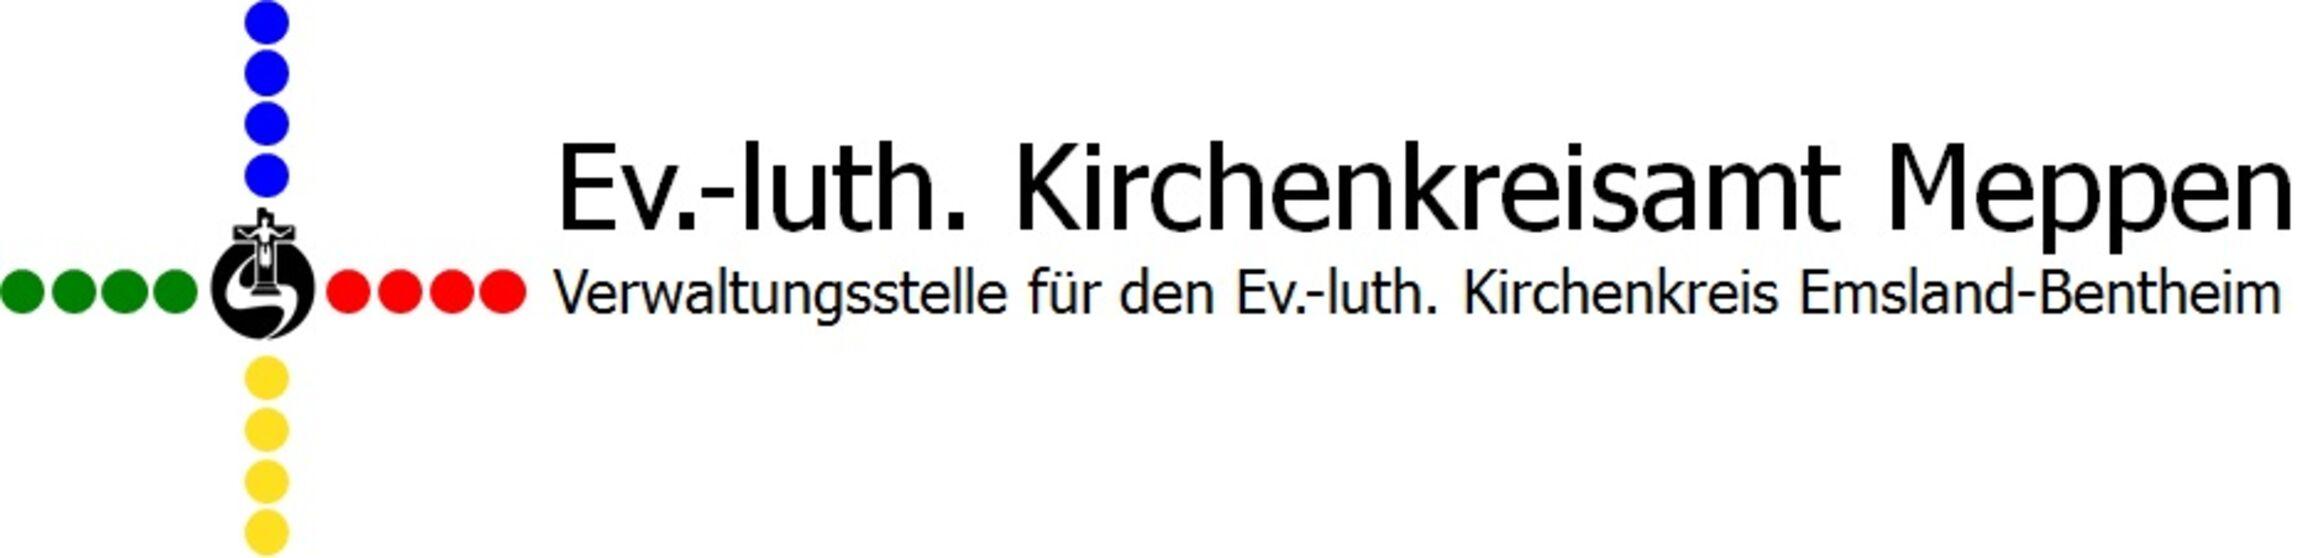 Logo des Ev.-luth. Kirchenkreisamtes Meppen